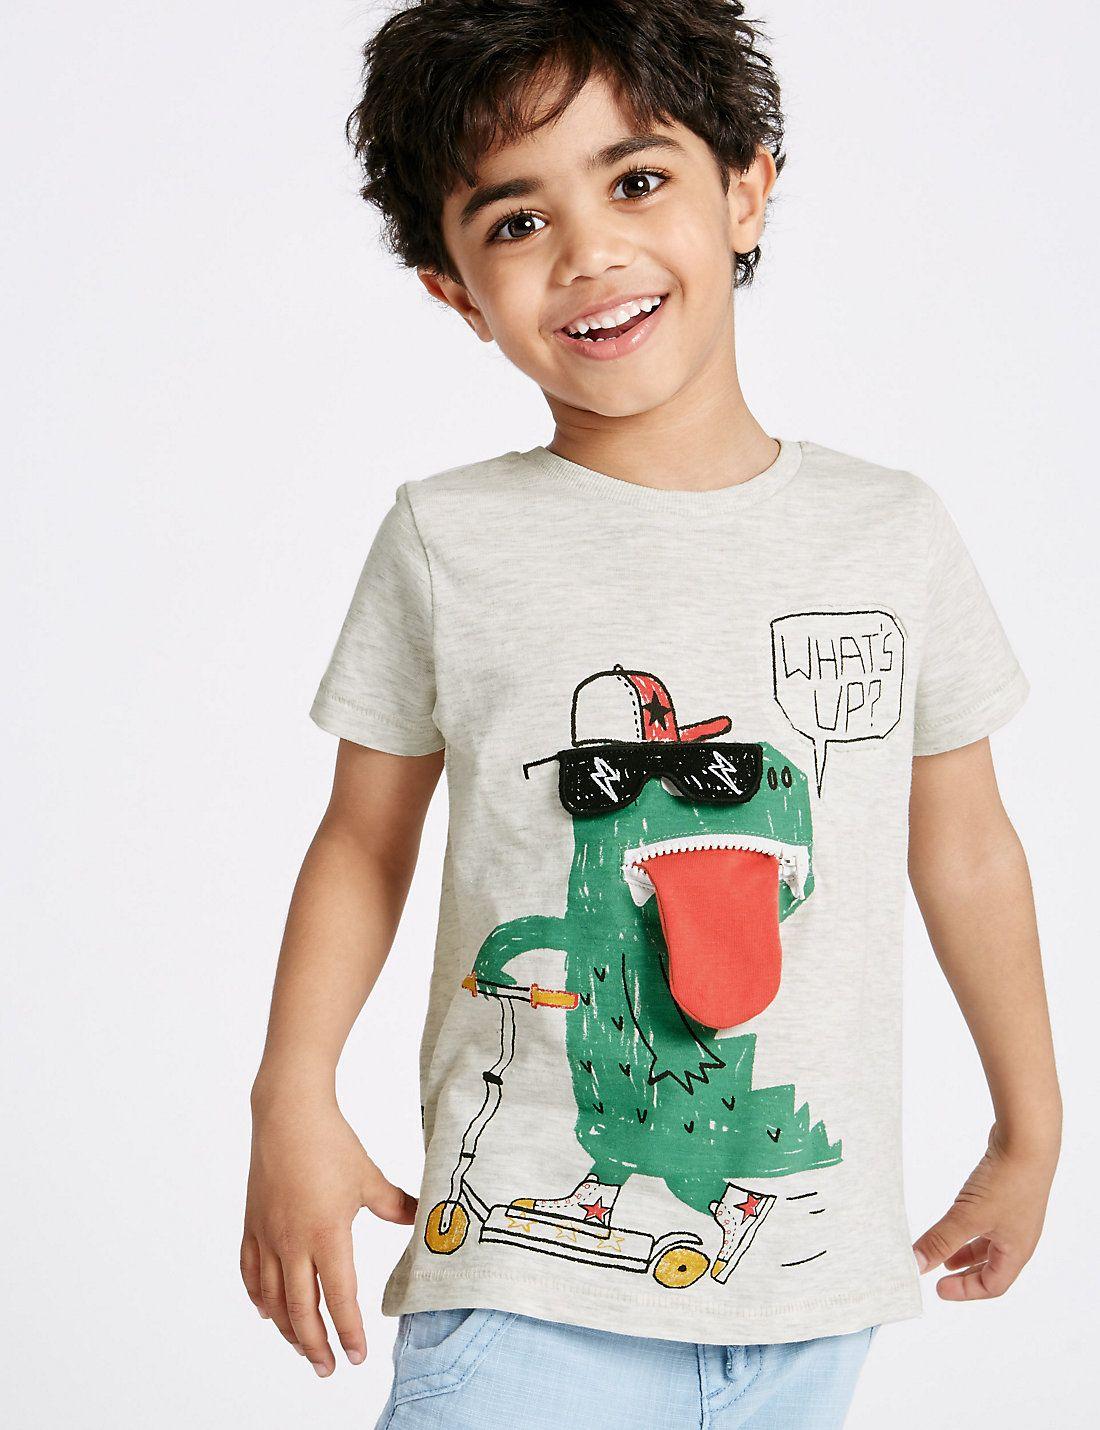 Baby Boys Long Sleeves T-shirt Cotton Shark Cartoon Design Kids Cute Sweatshirt